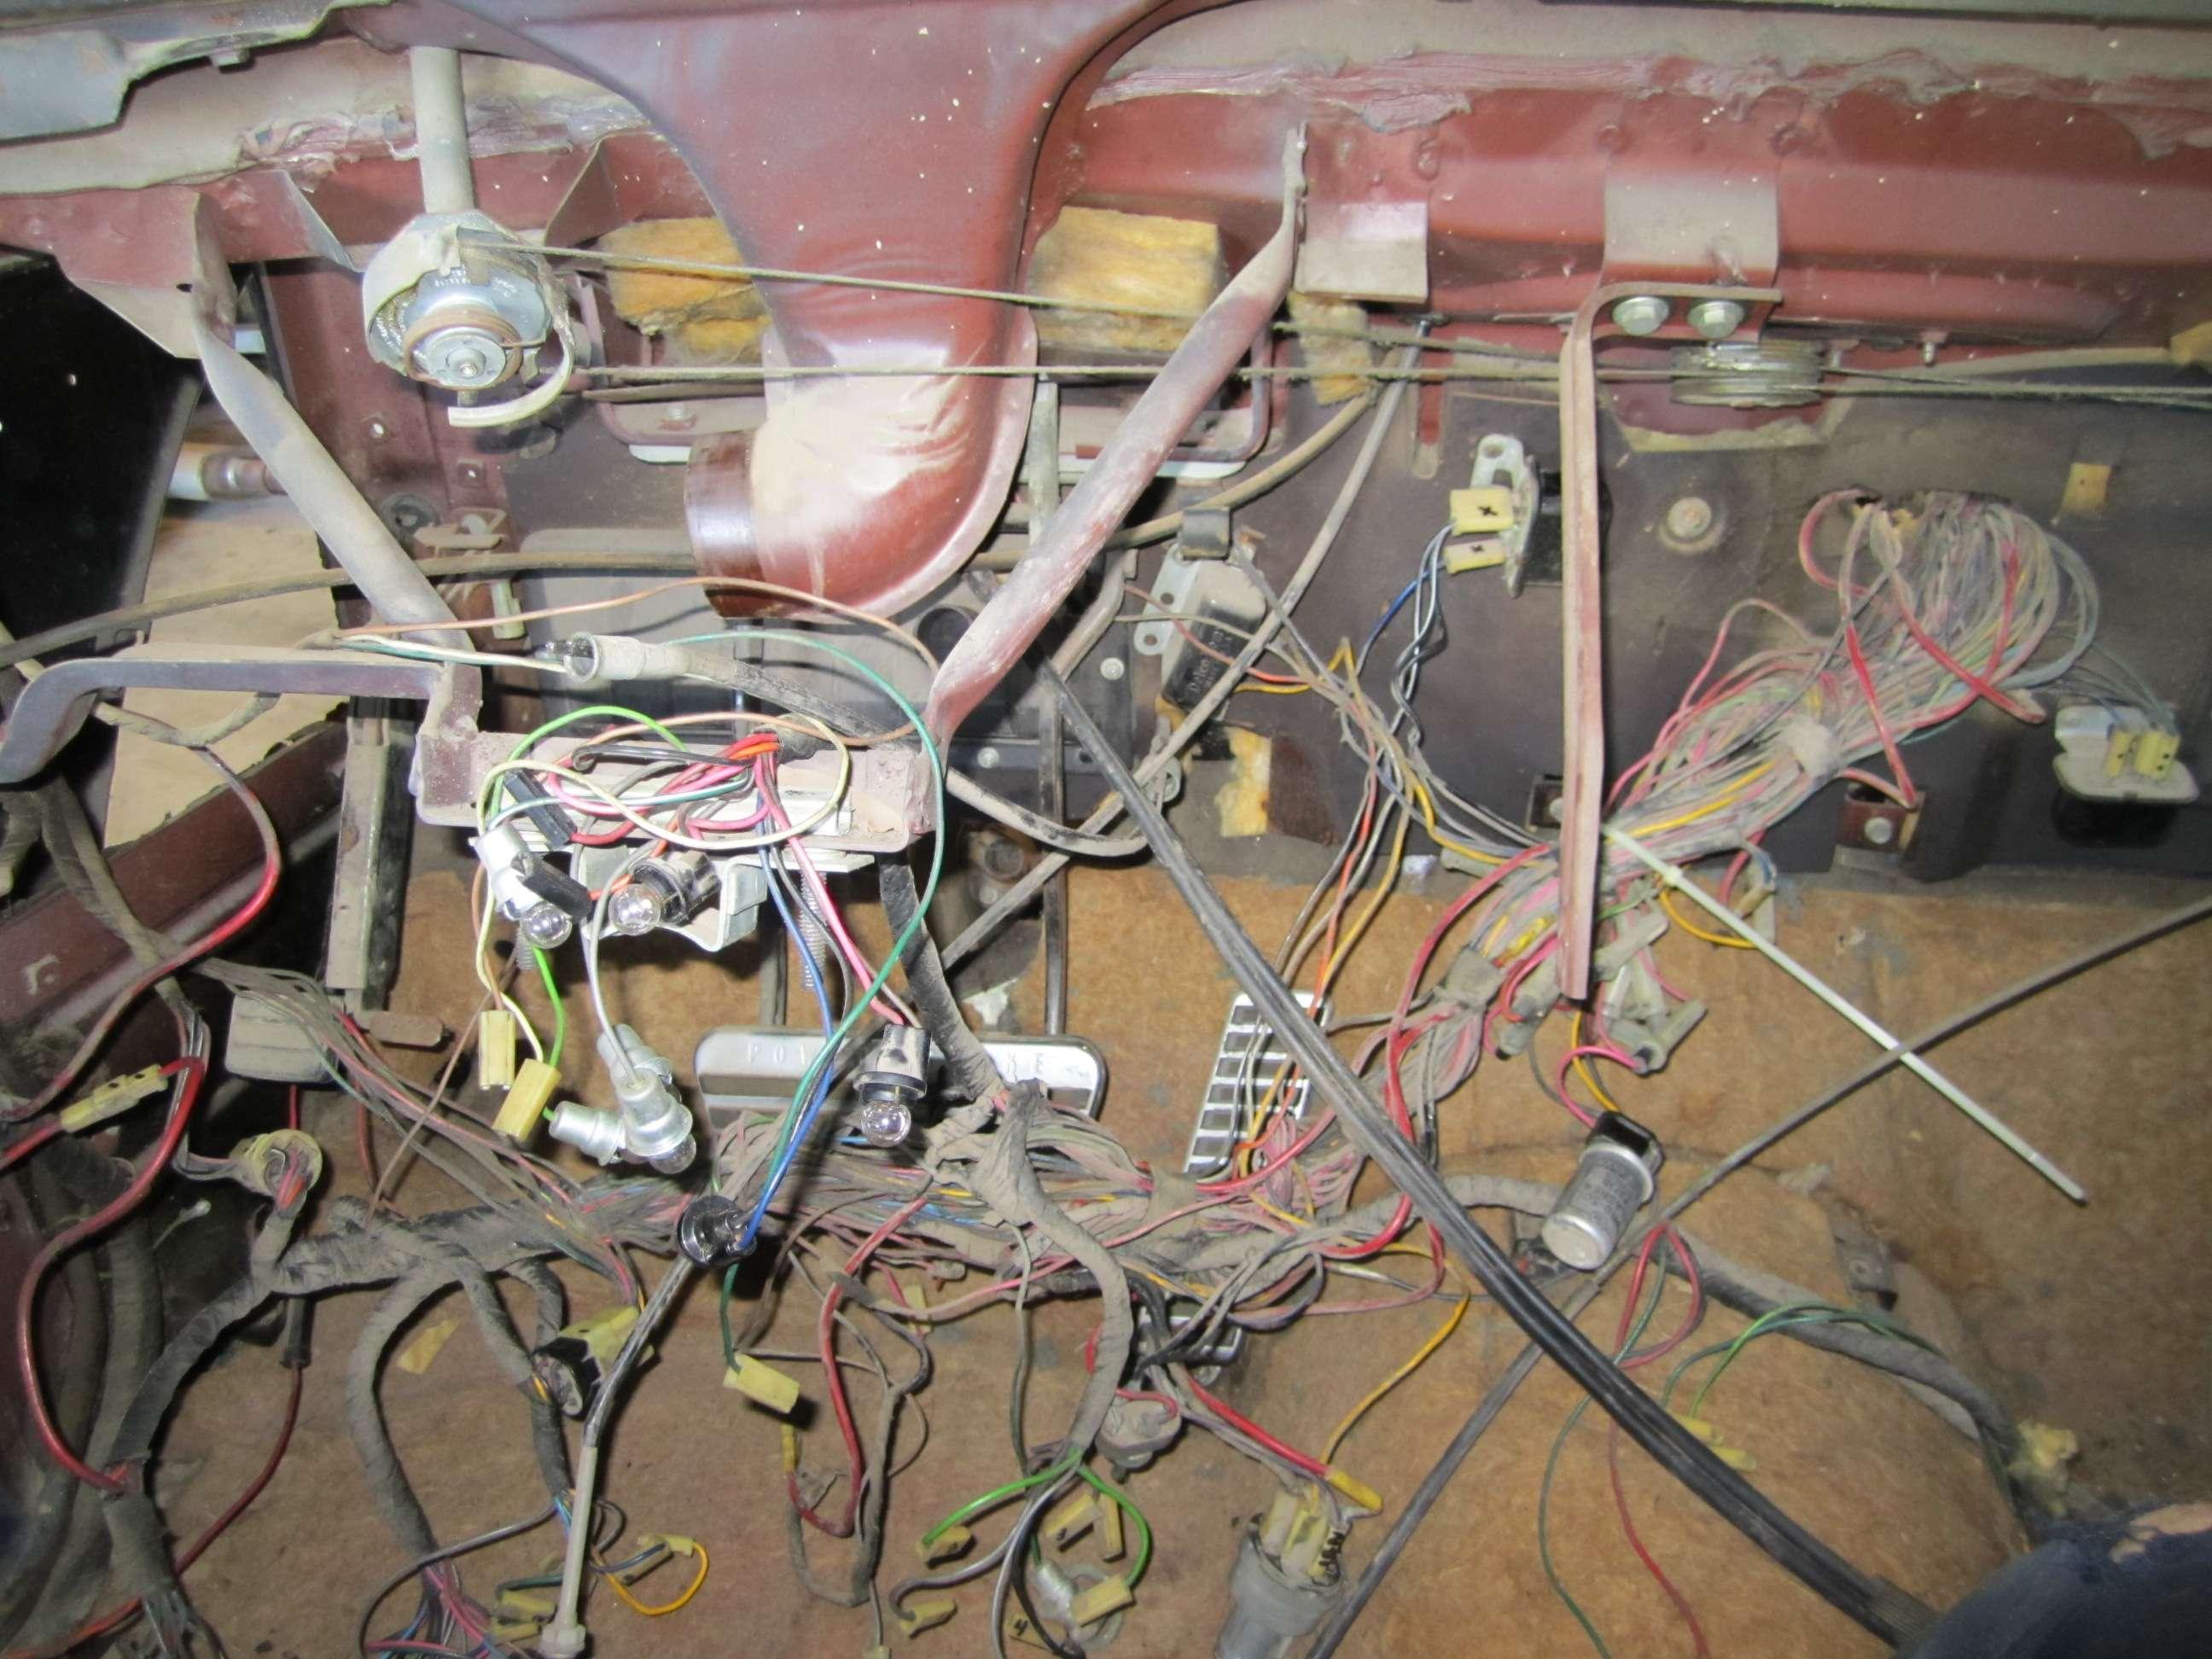 Eldorado Brougham - 1959 cadillac wiring harness